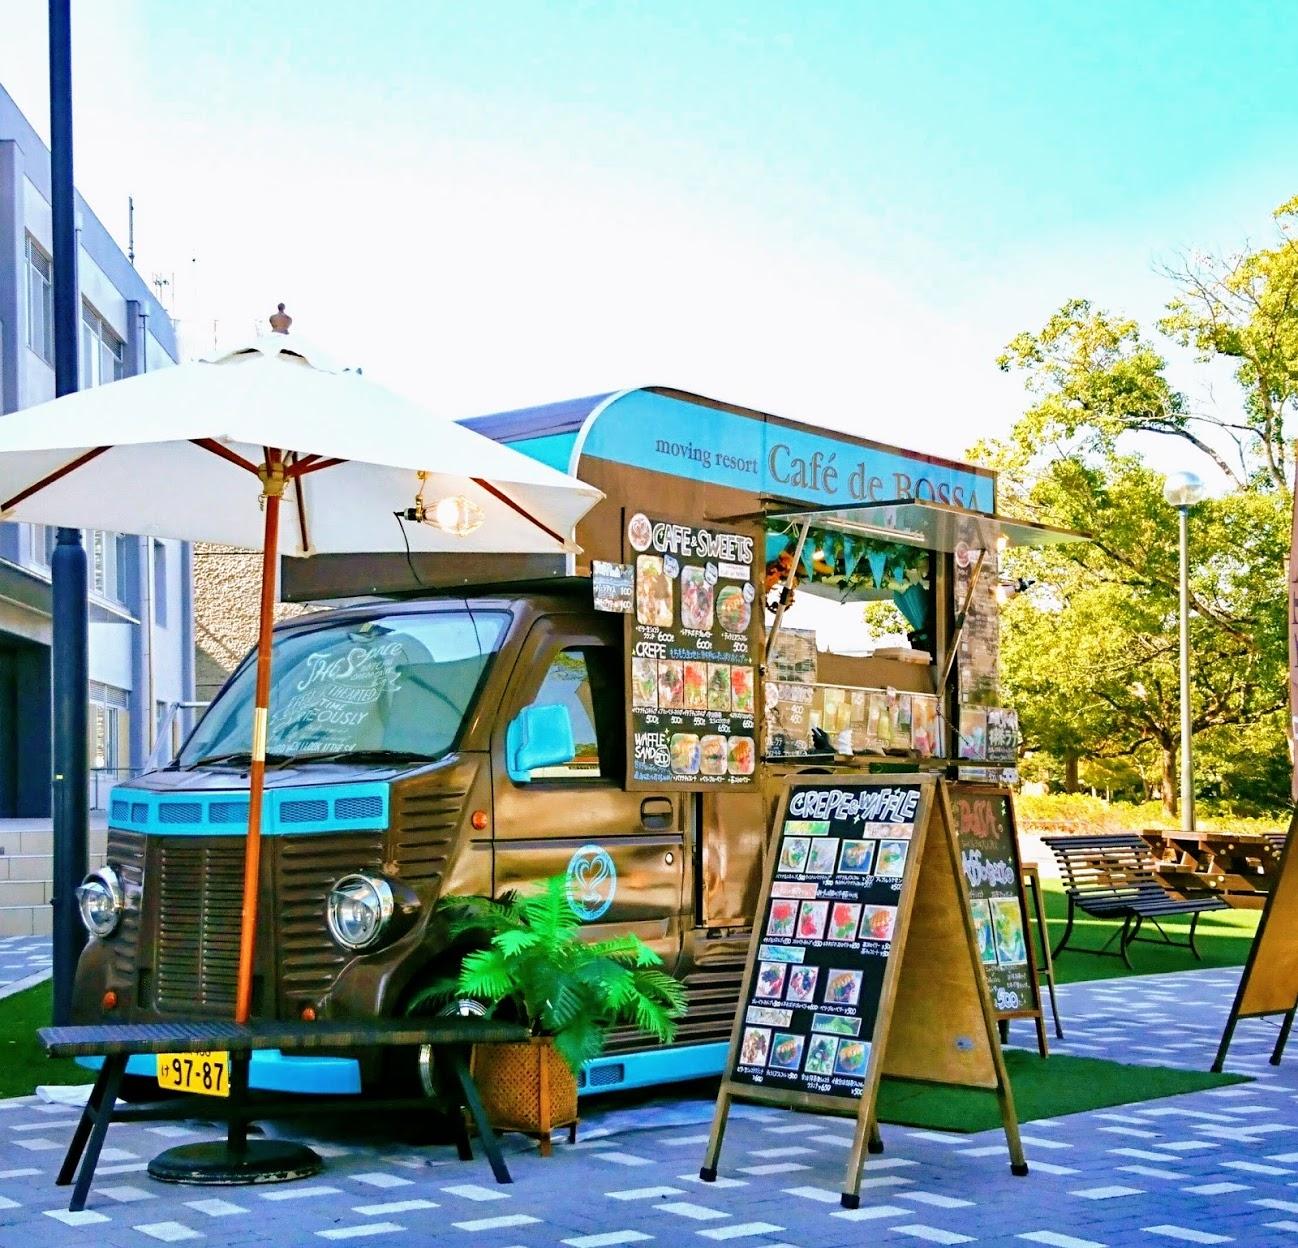 moving resort Cafe de BOSSA(ムービンリゾートカフェドボッサ)